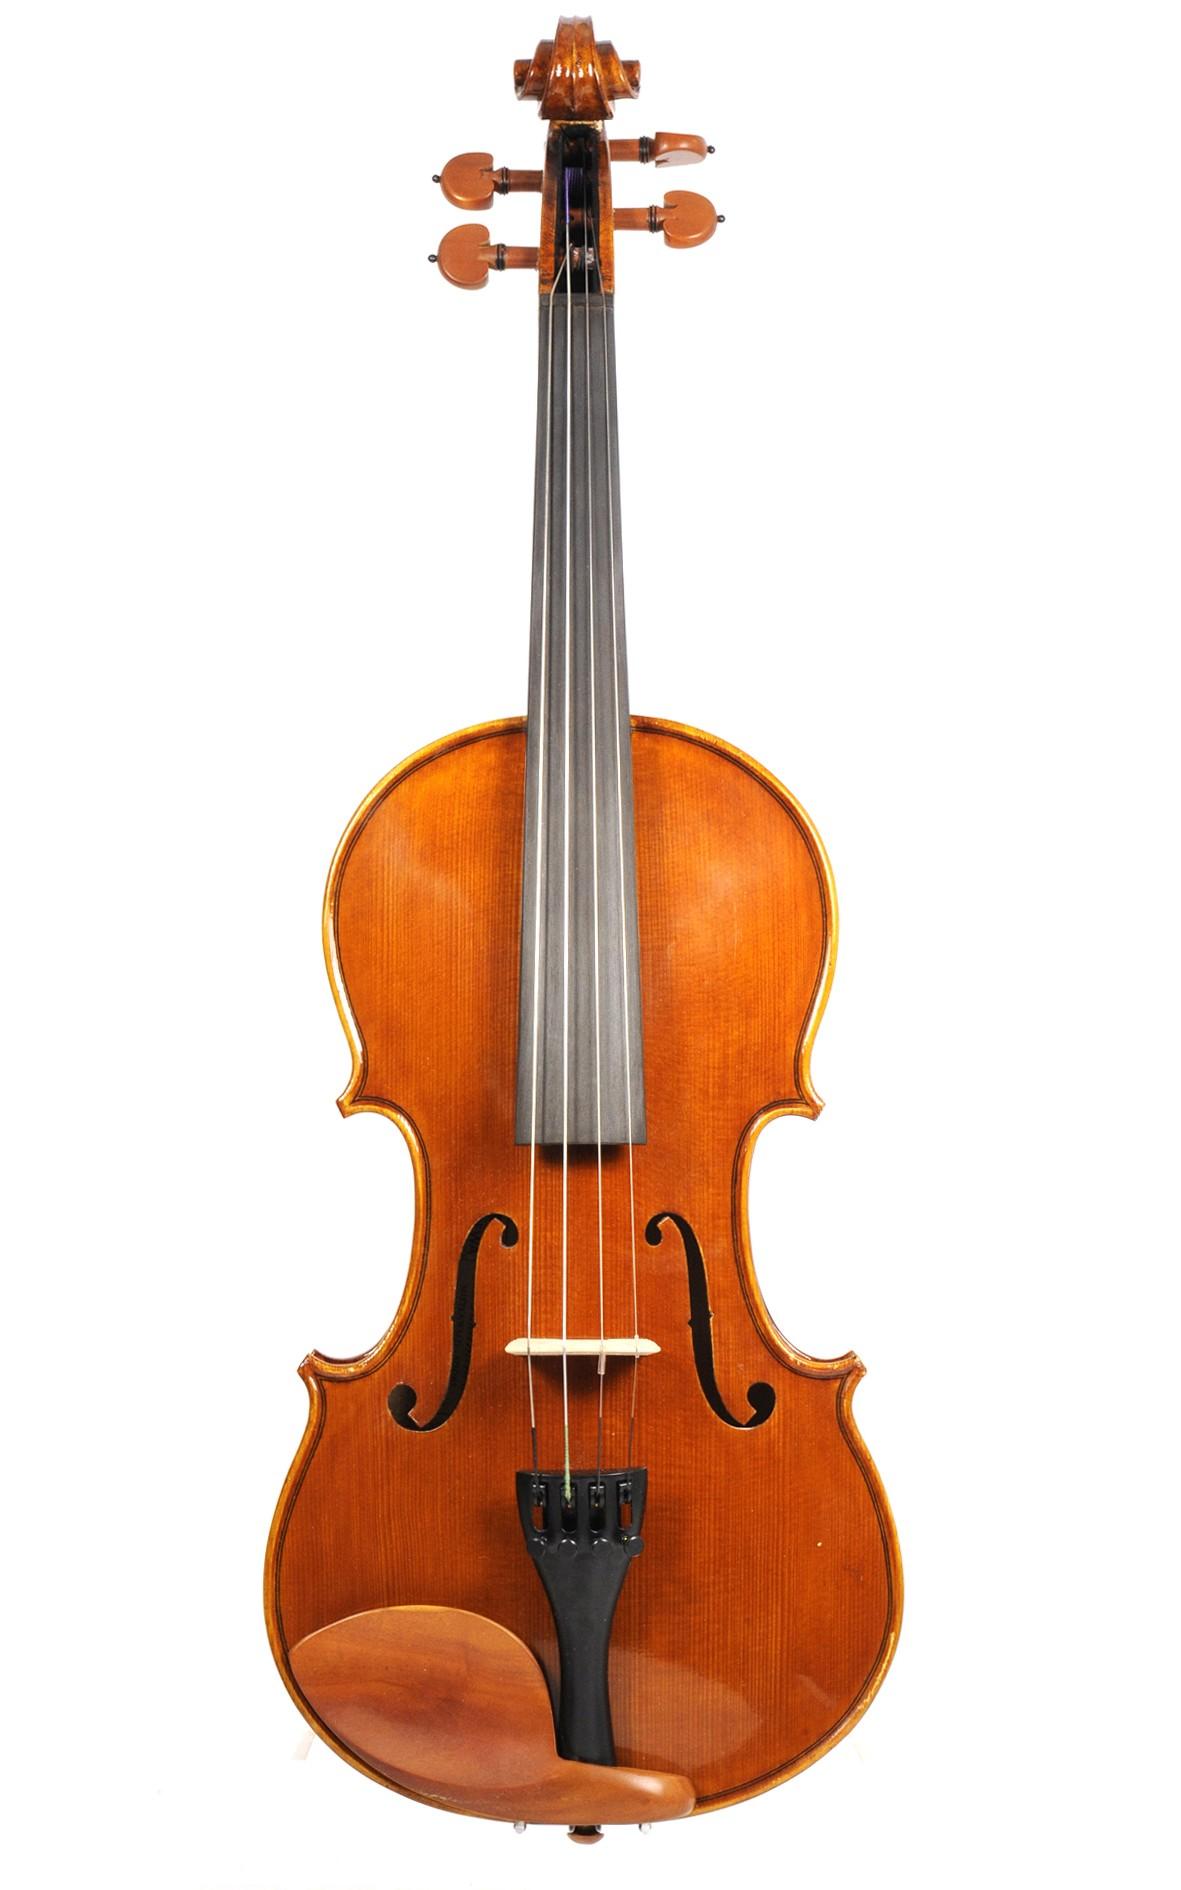 GEWA violin Mittenwald 2002 - top view